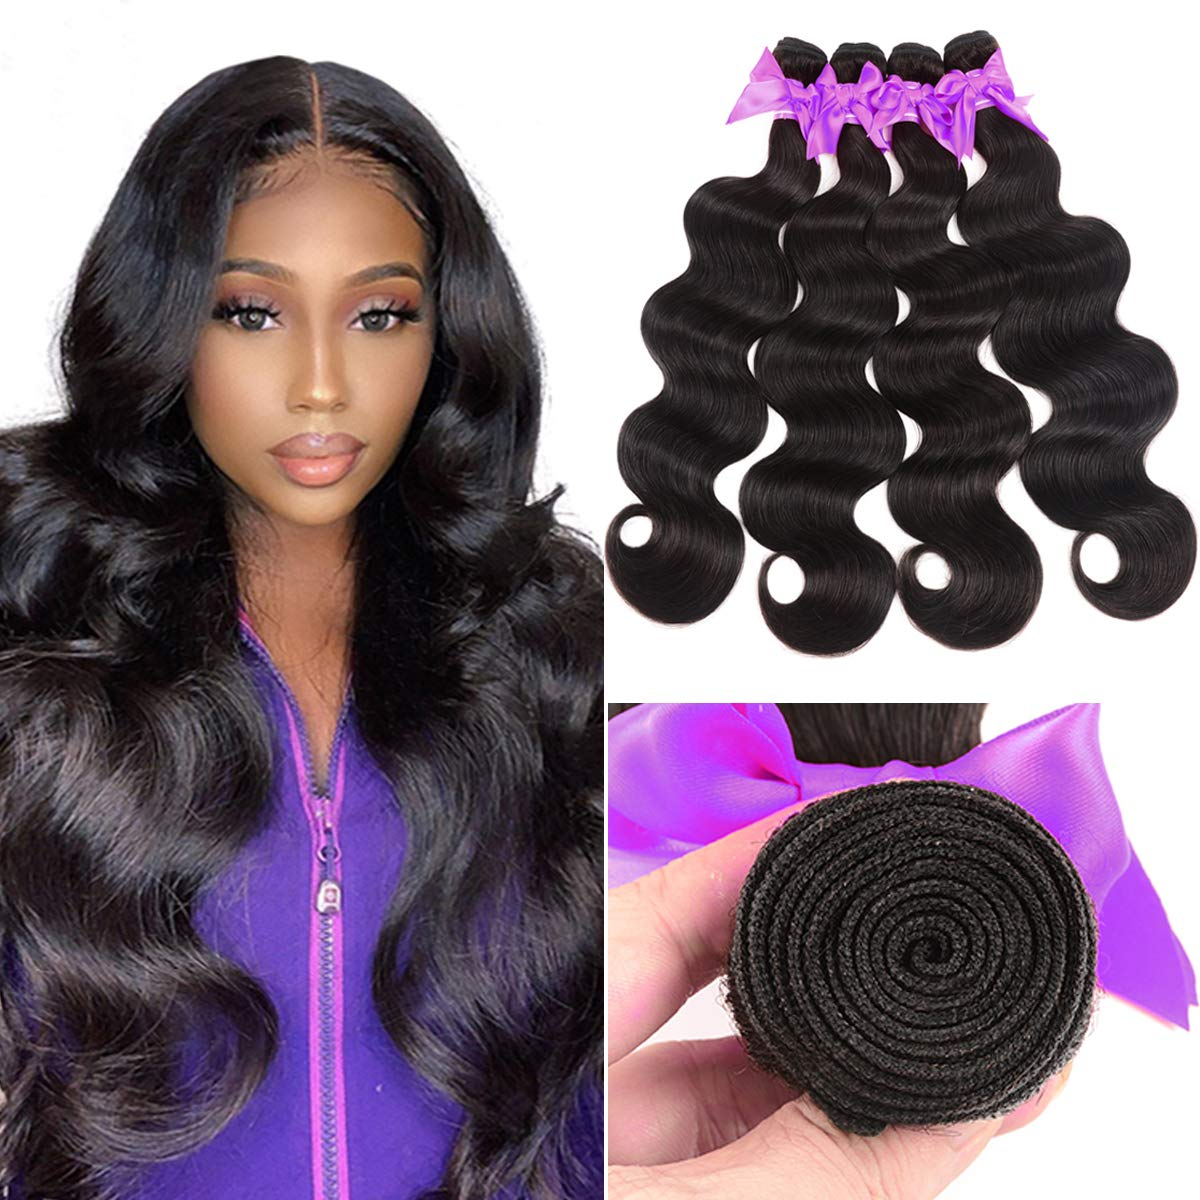 Miss CARA Body Wave Sale Special Price Virgin Hair 4 24 28 100% Bundles Unp 26 Super sale 22